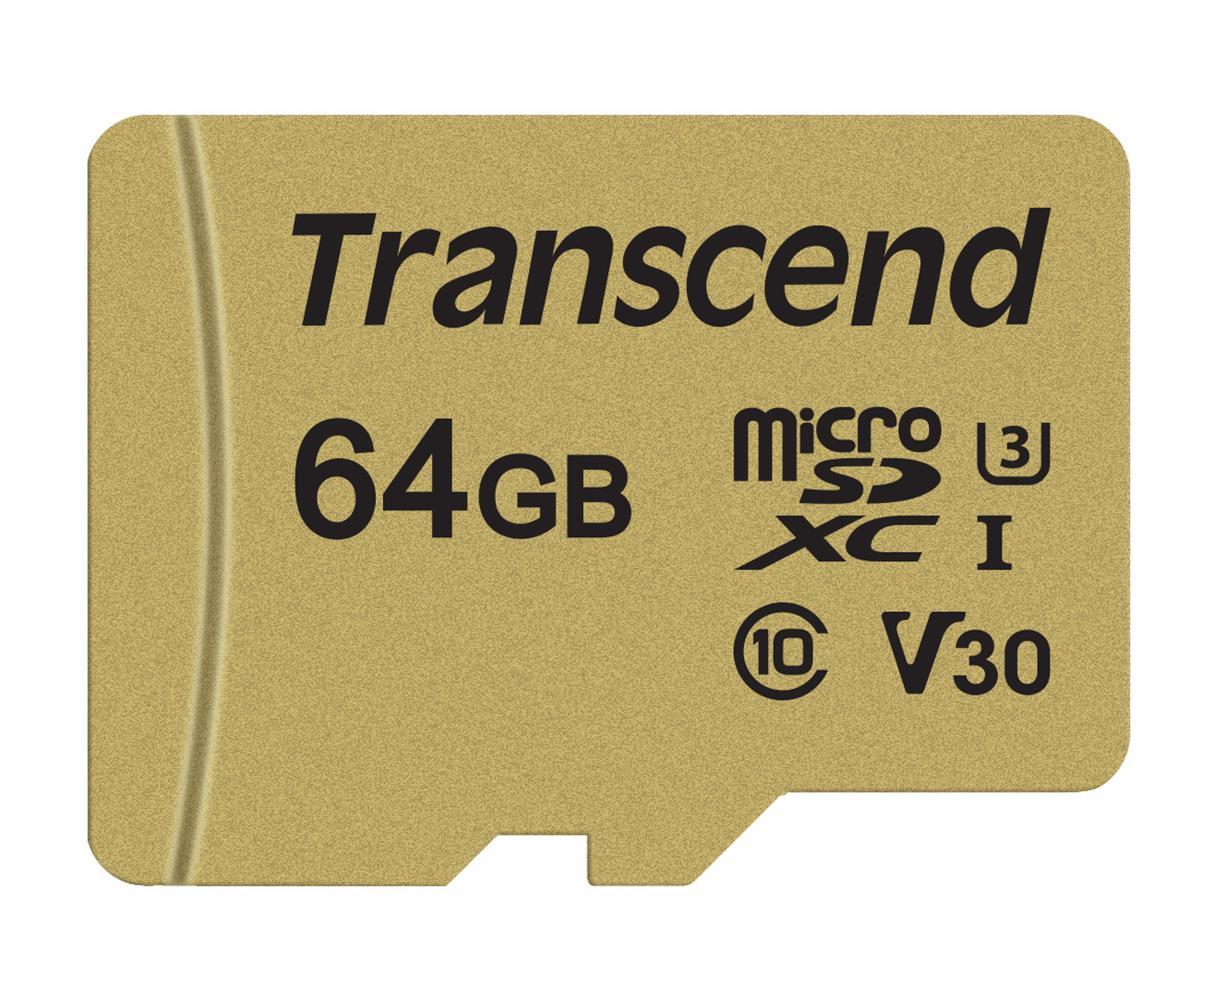 TS64GUSD500S [64GB]